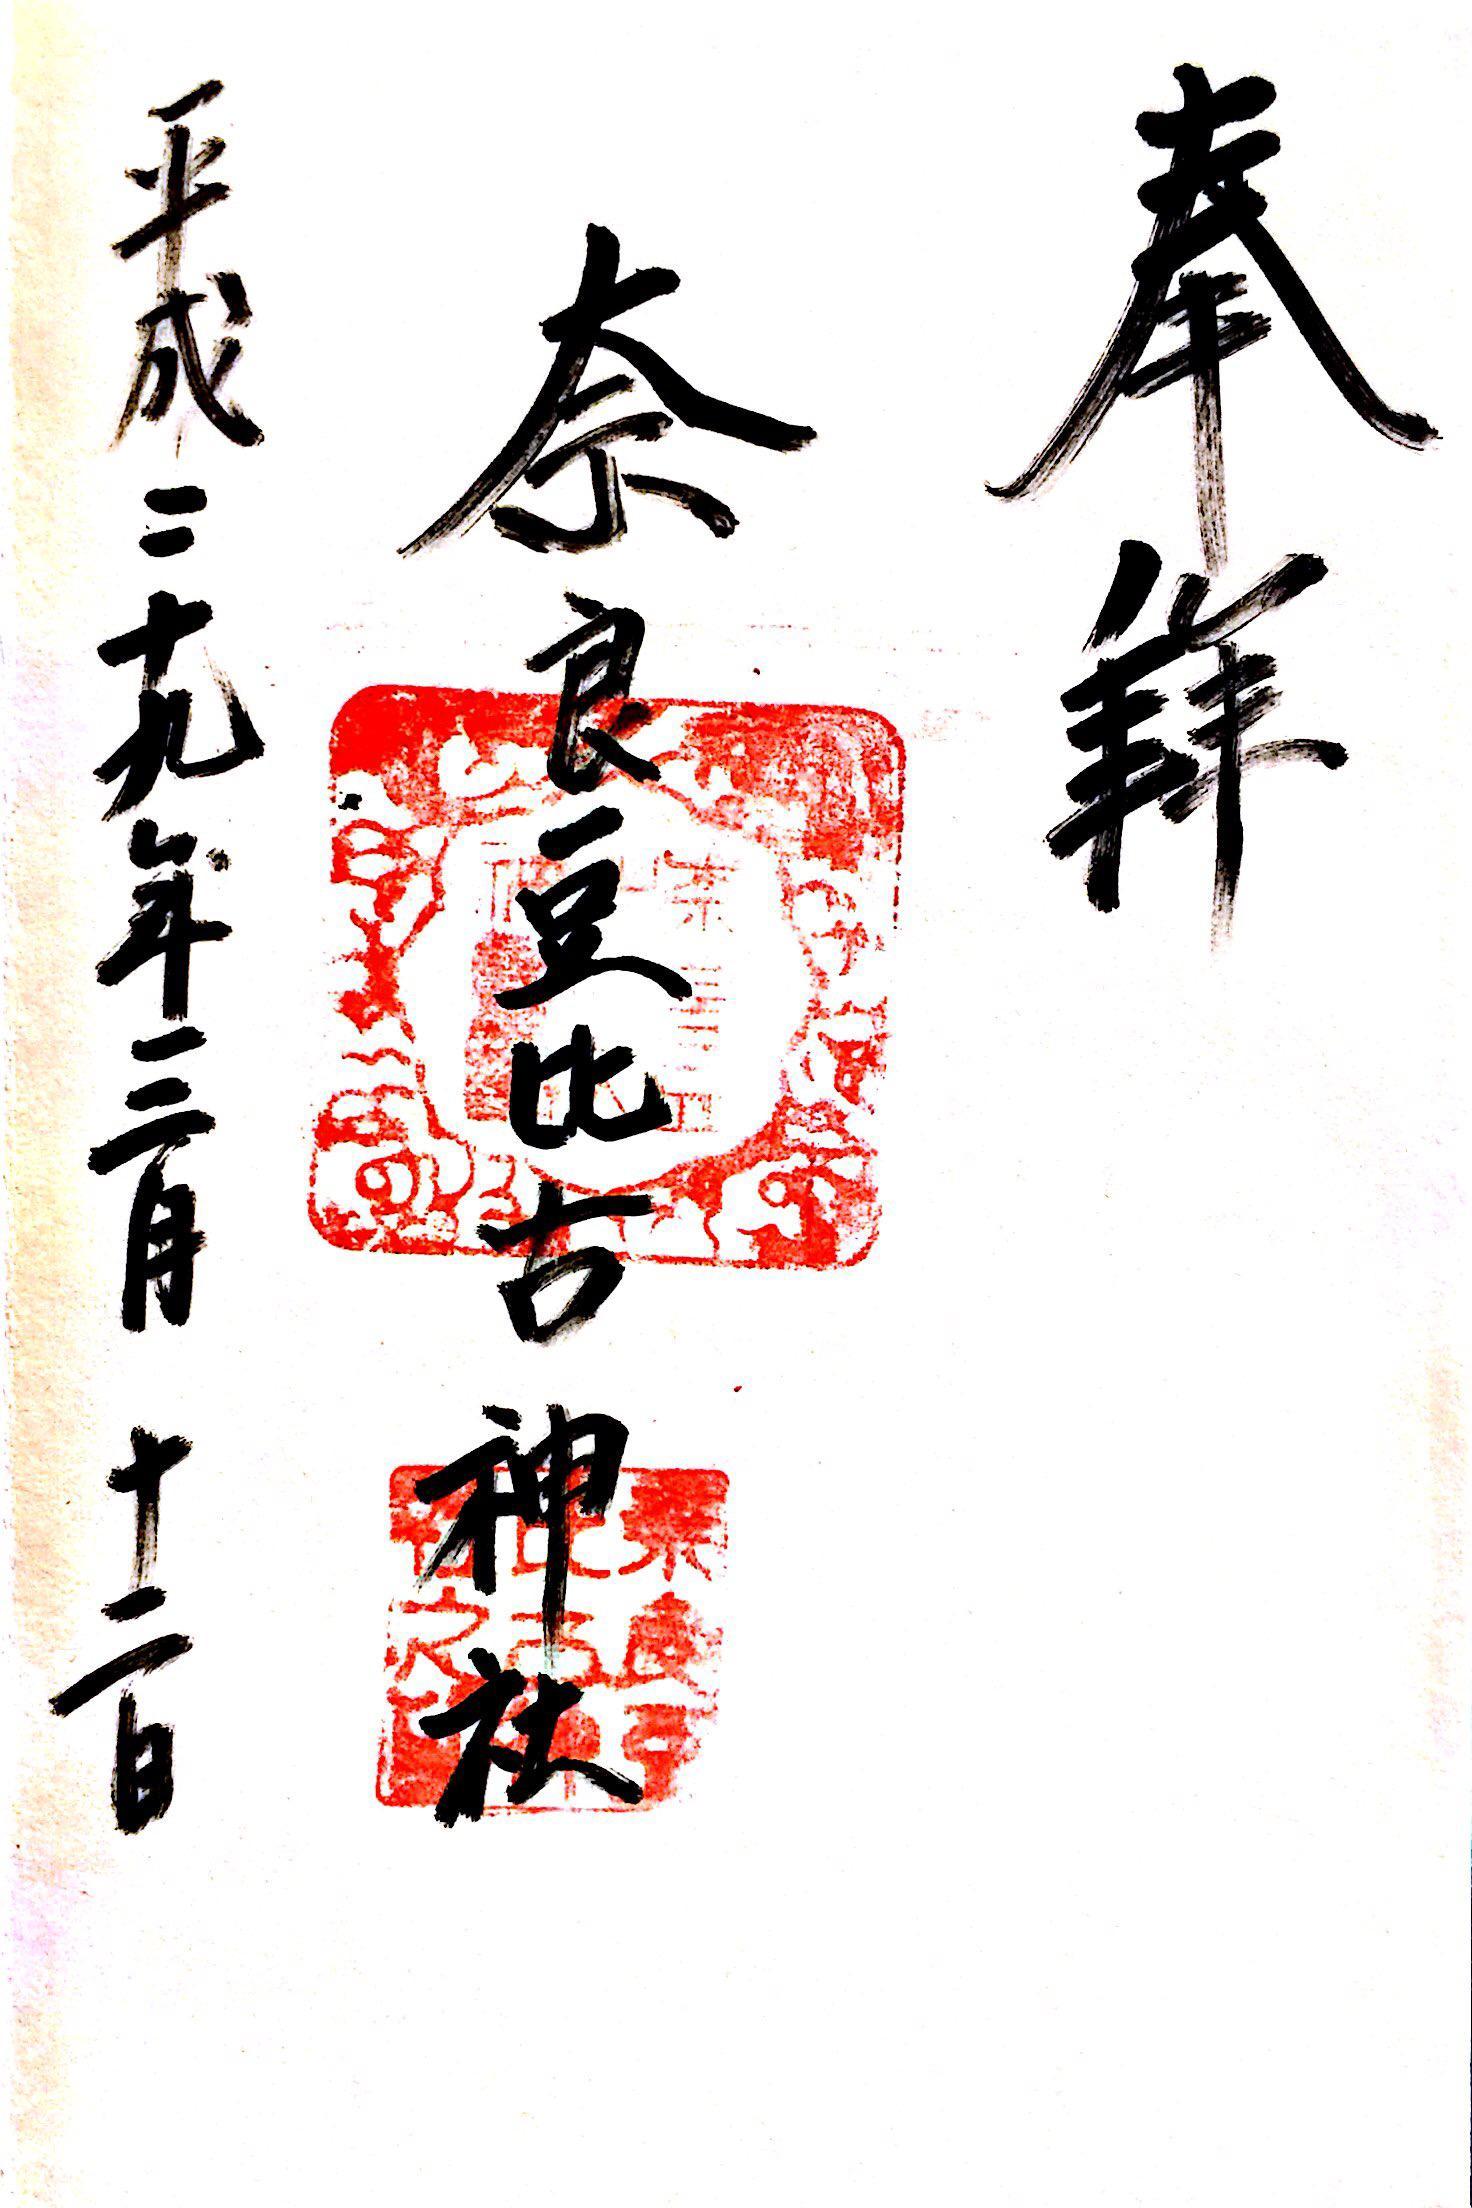 奈良豆比古神社の御朱印